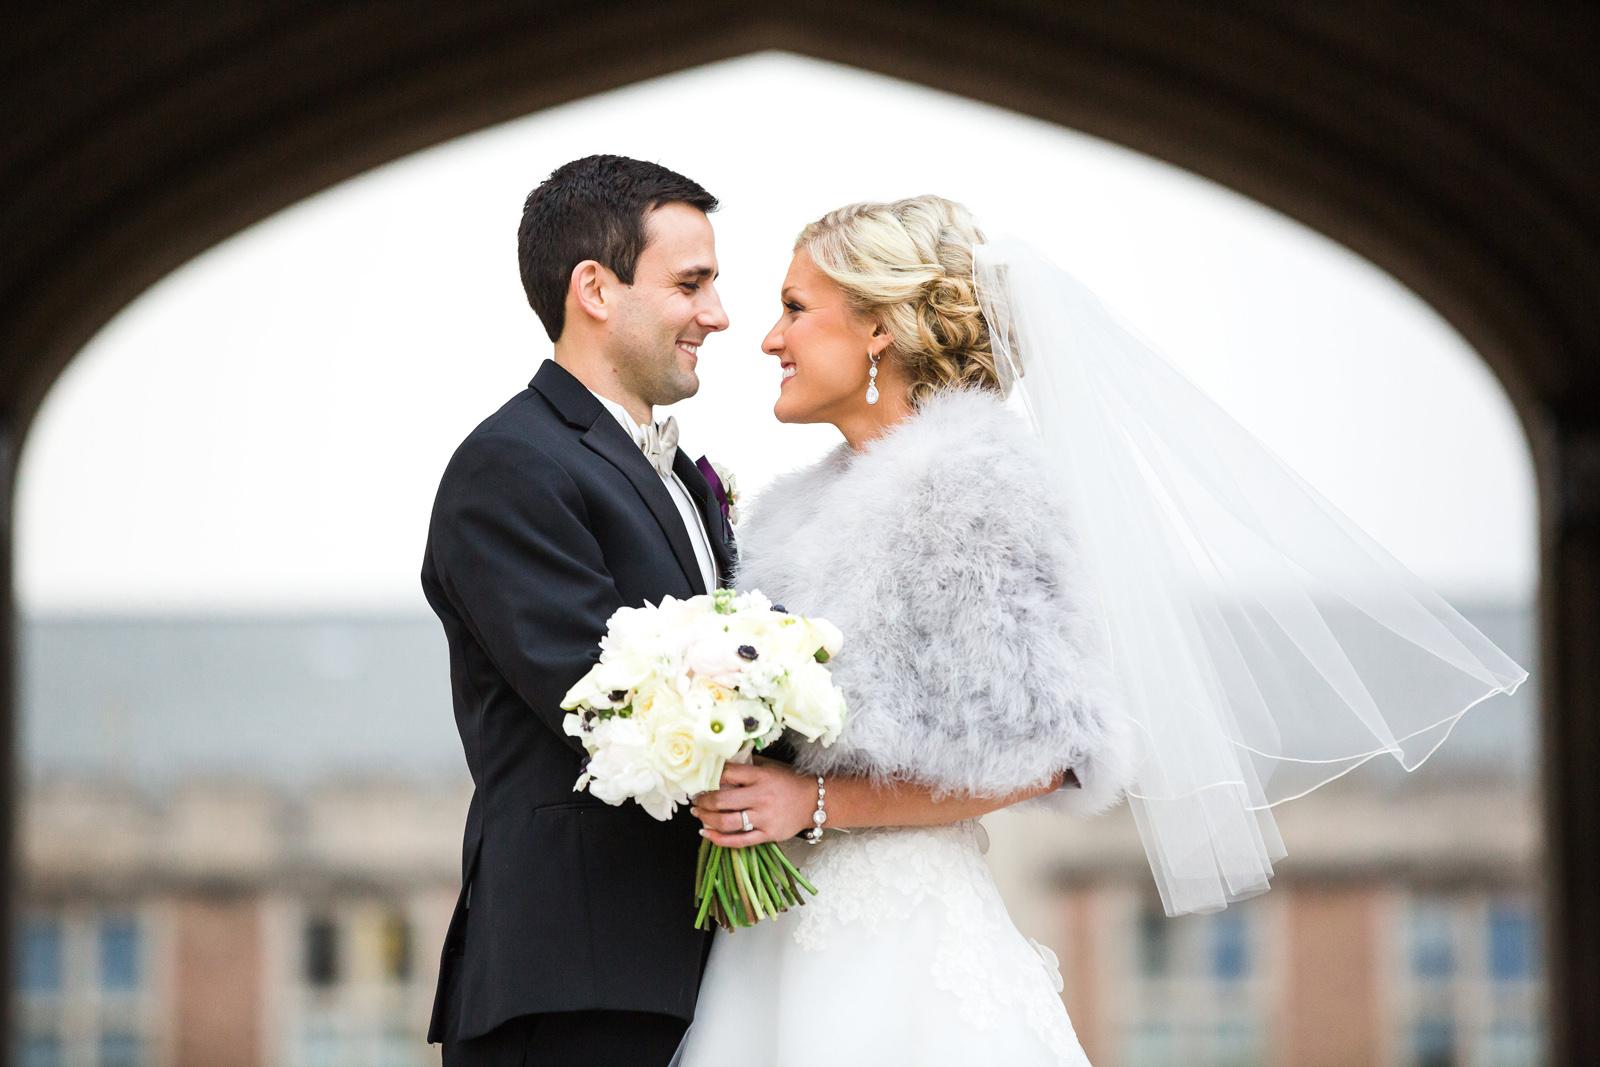 St Louis Washington University Wedding Photos_20141115_17204389.jpg